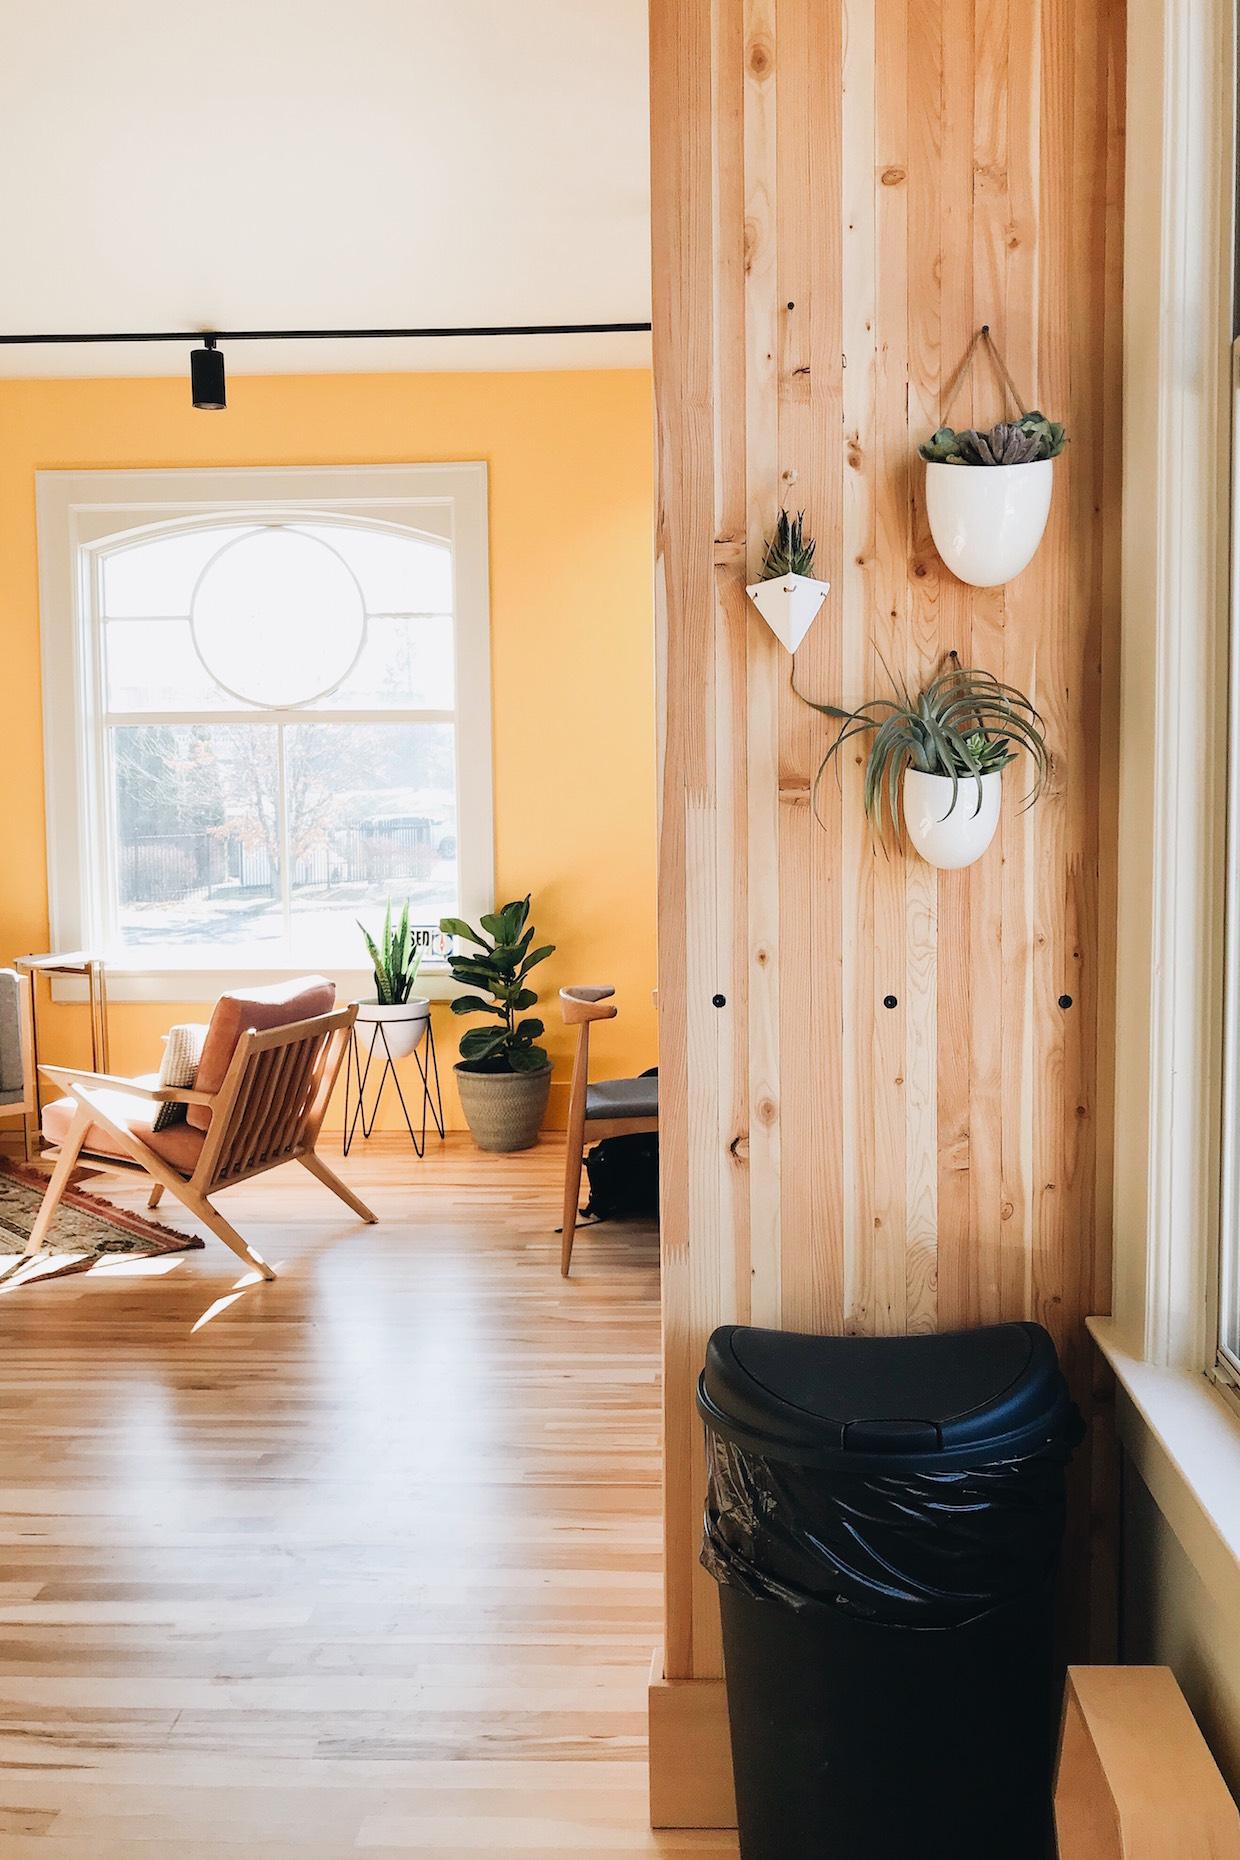 Ladder coffee cafe spokane washington